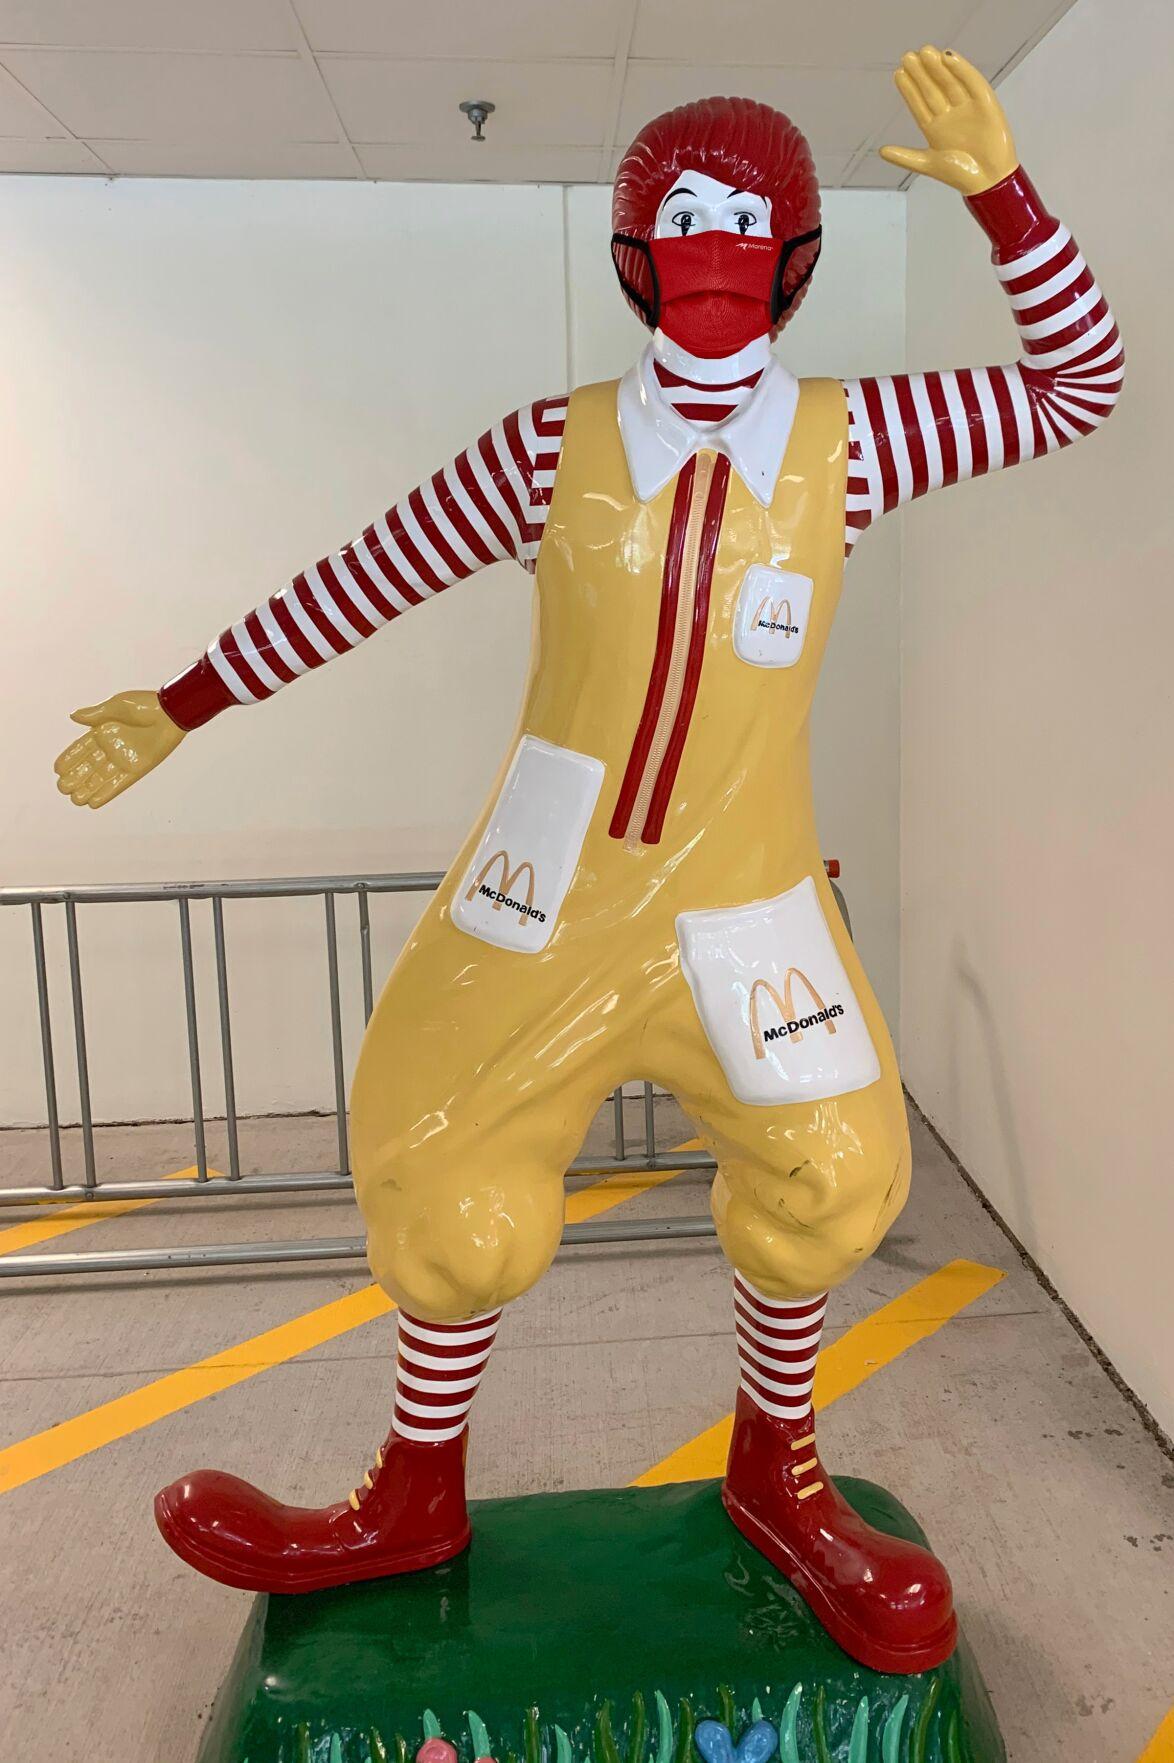 090220_MNS_Marena_masks Ronald McDonald